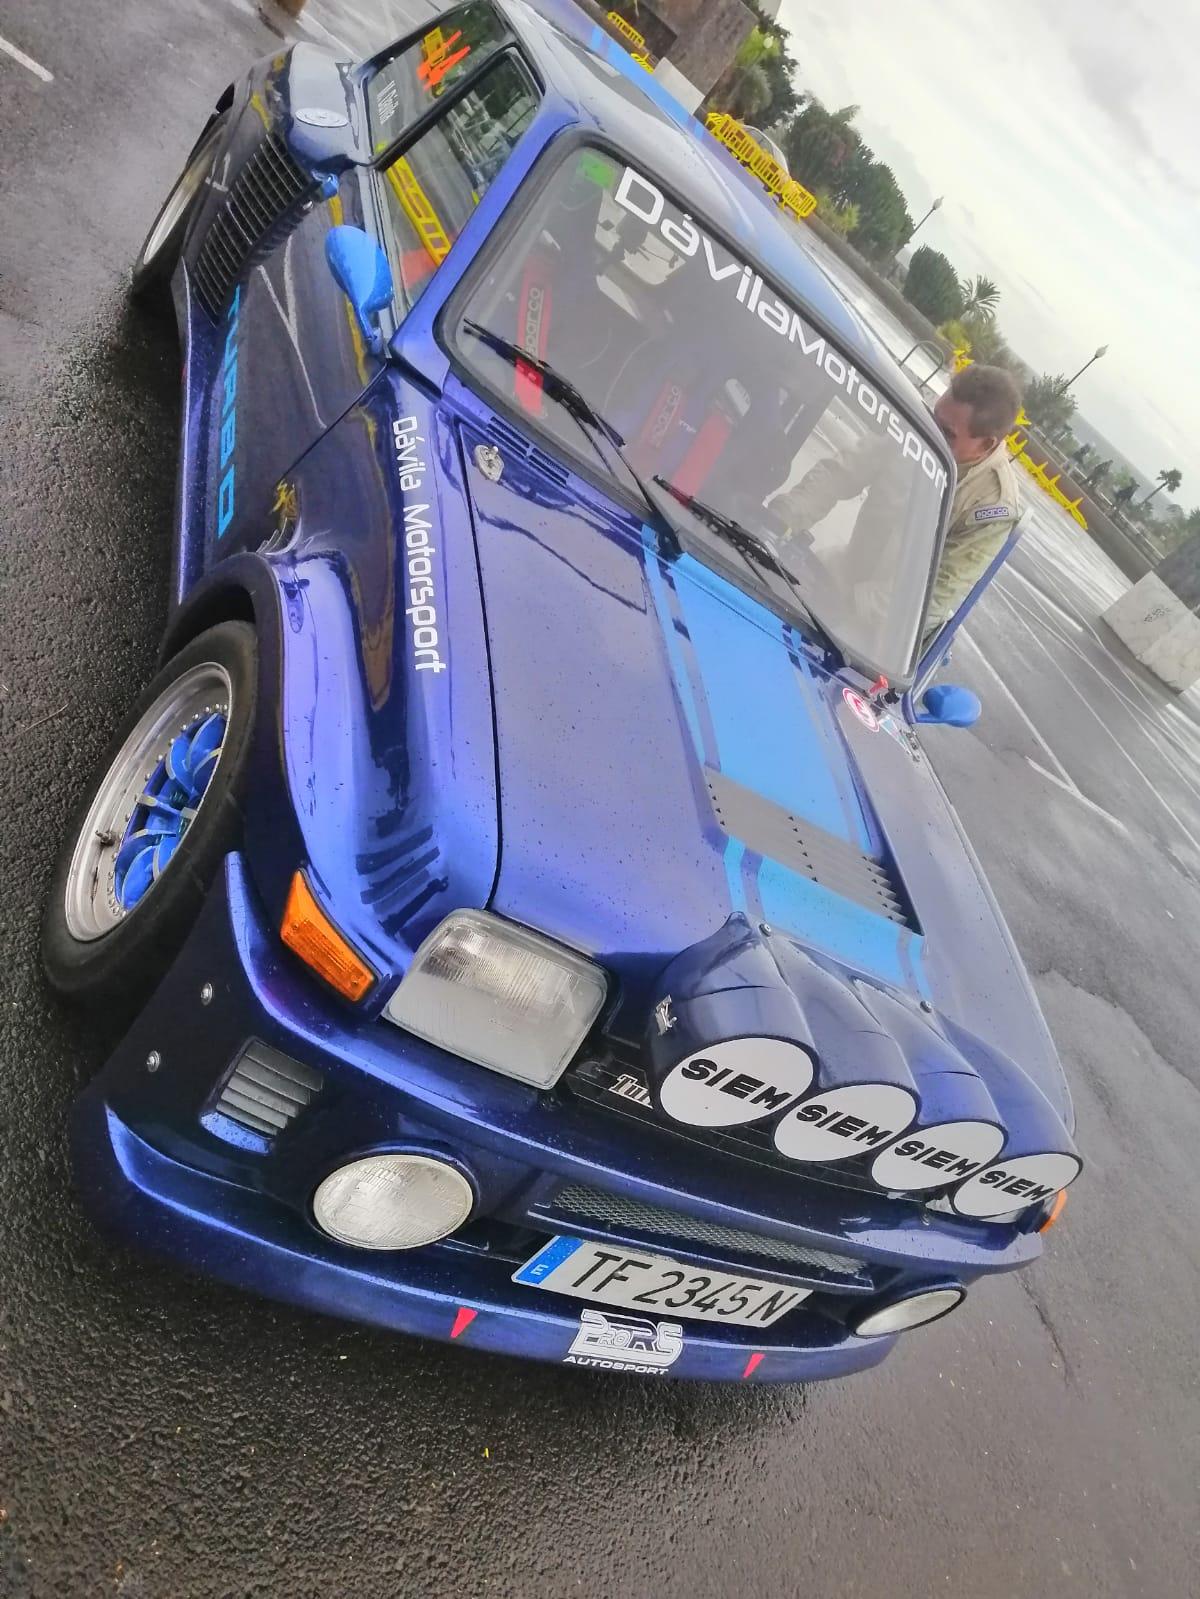 Renault 5 Maxi Turbo - Melchor Dávila